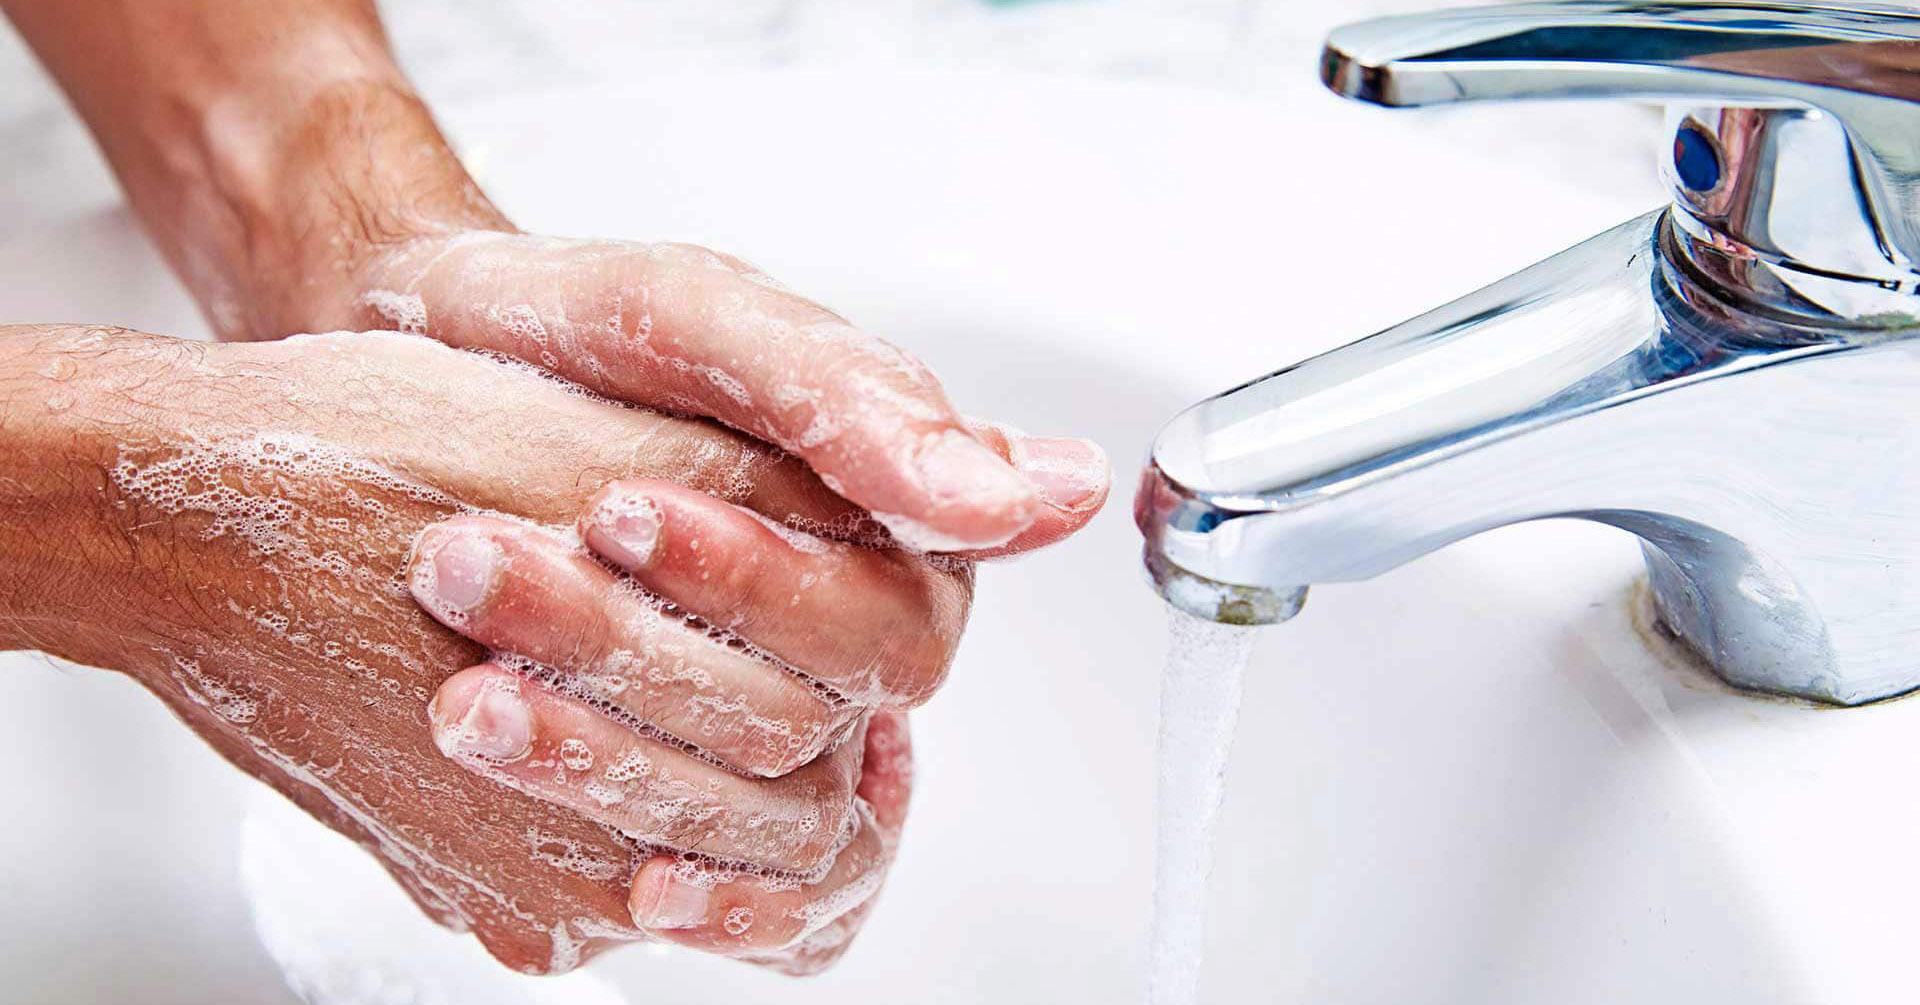 lavato mani Ignaz Semmelweis